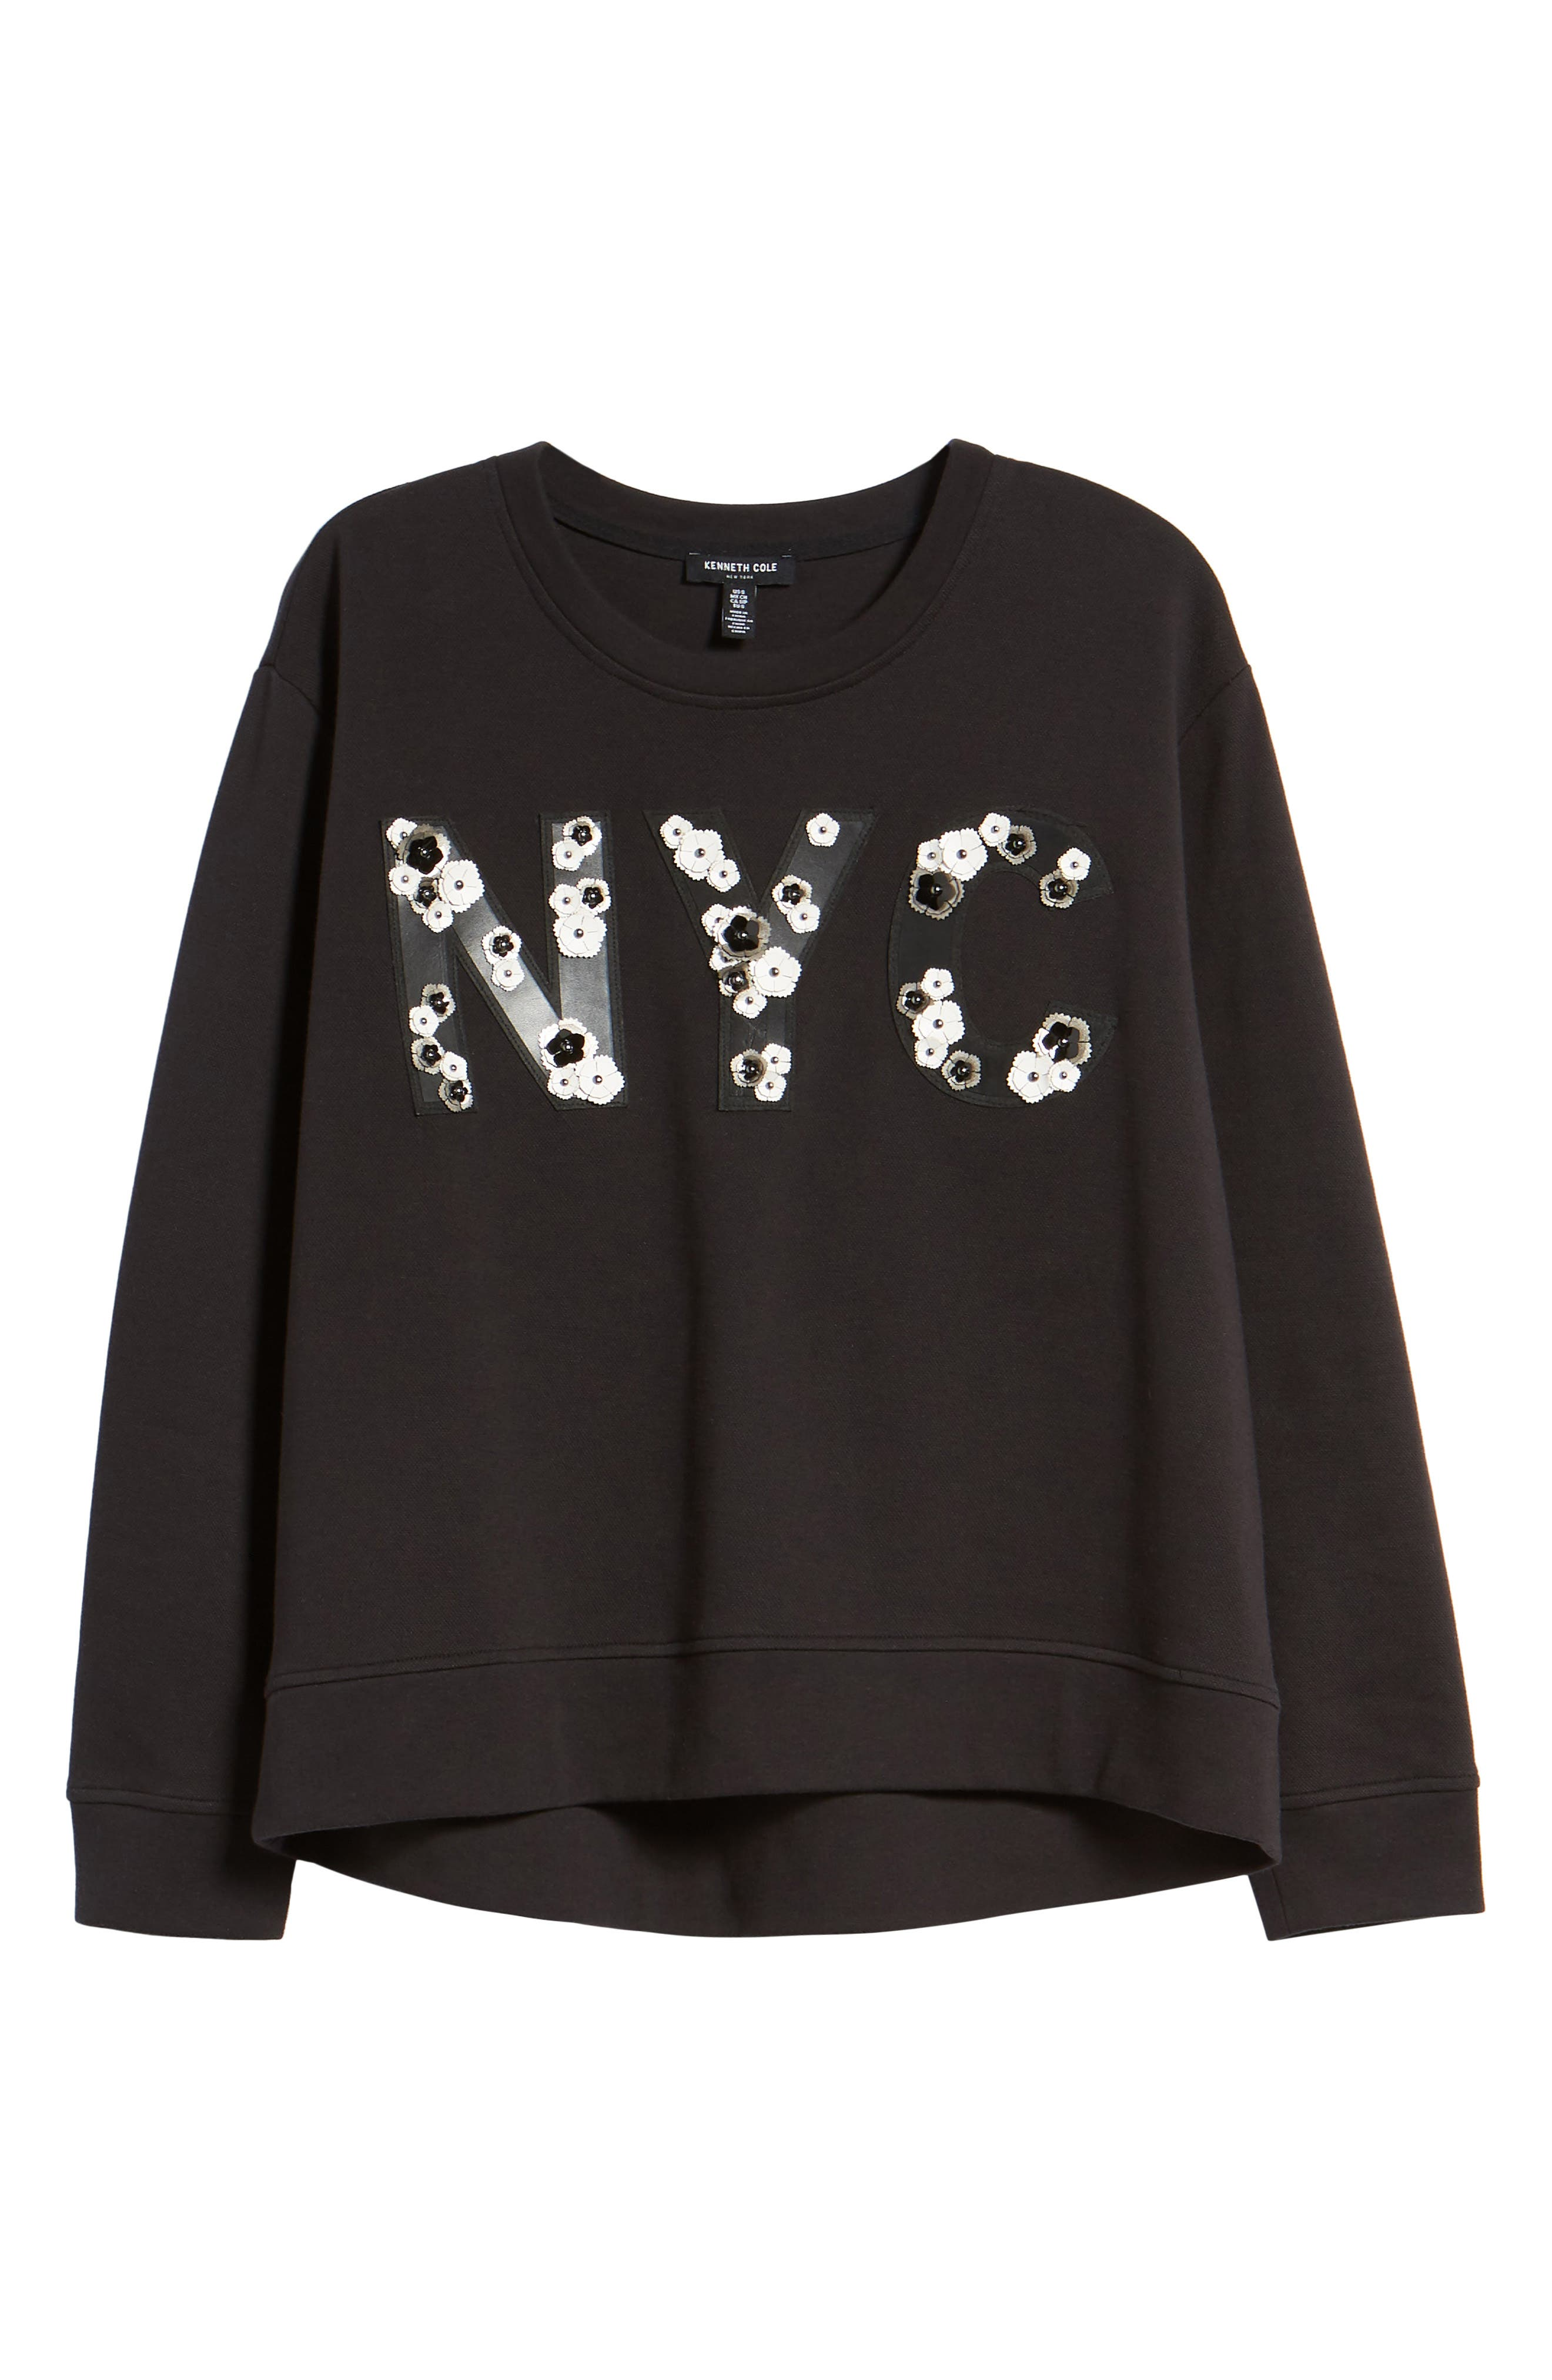 NYC Sweatshirt,                             Alternate thumbnail 7, color,                             BLACK